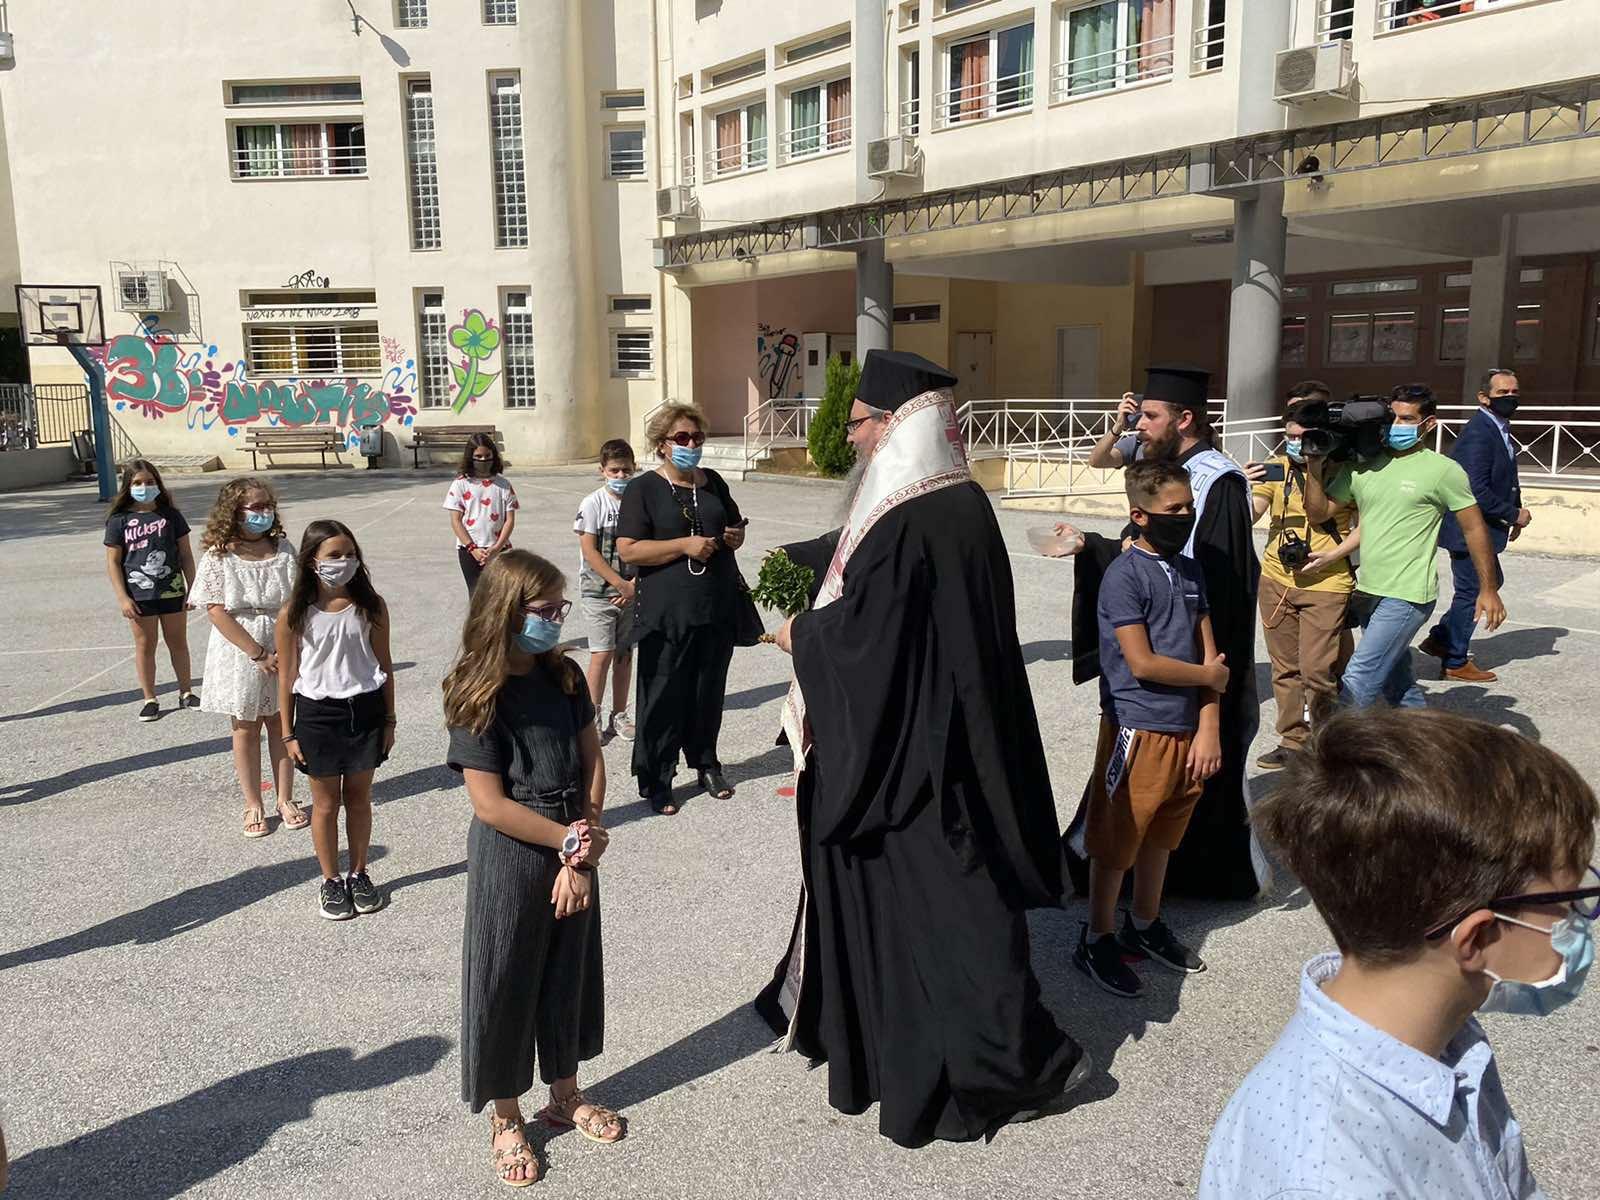 Agiasmoi 2020 5 - Αγιασμούς σε Σχολικές Μονάδες τέλεσε ο Σεβασμιώτατος